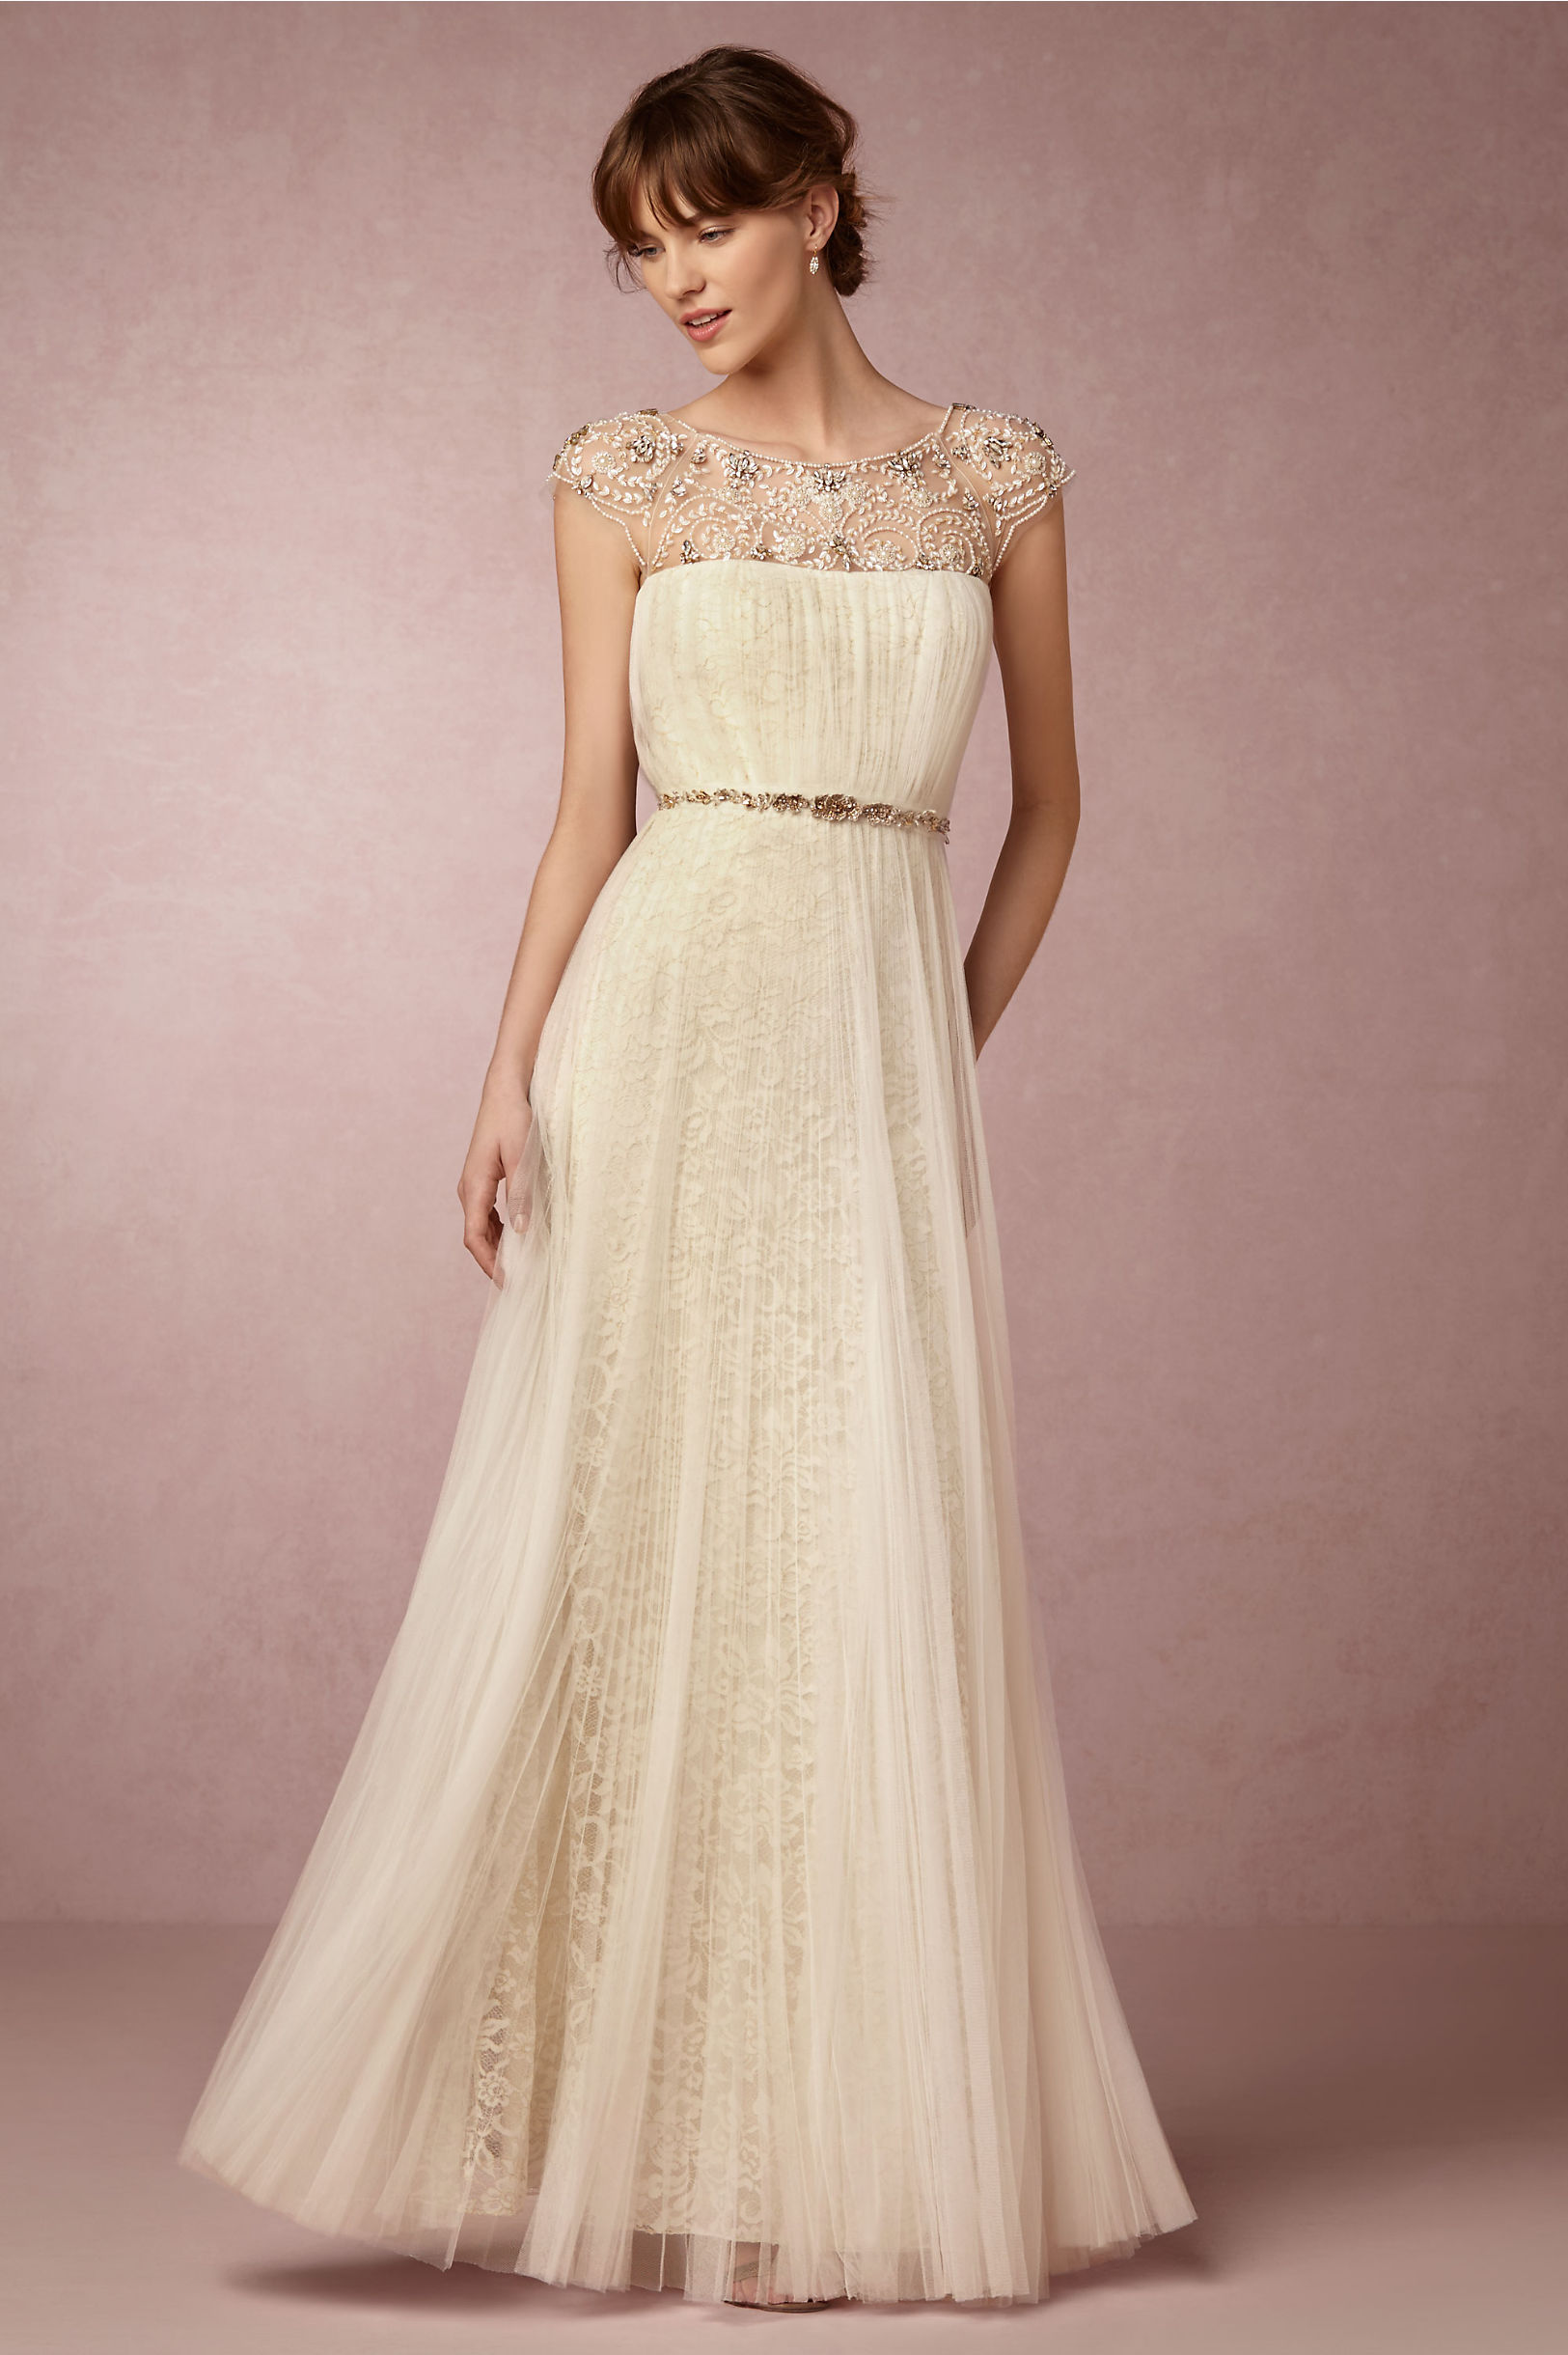 Tiernan Gown in Bride | BHLDN